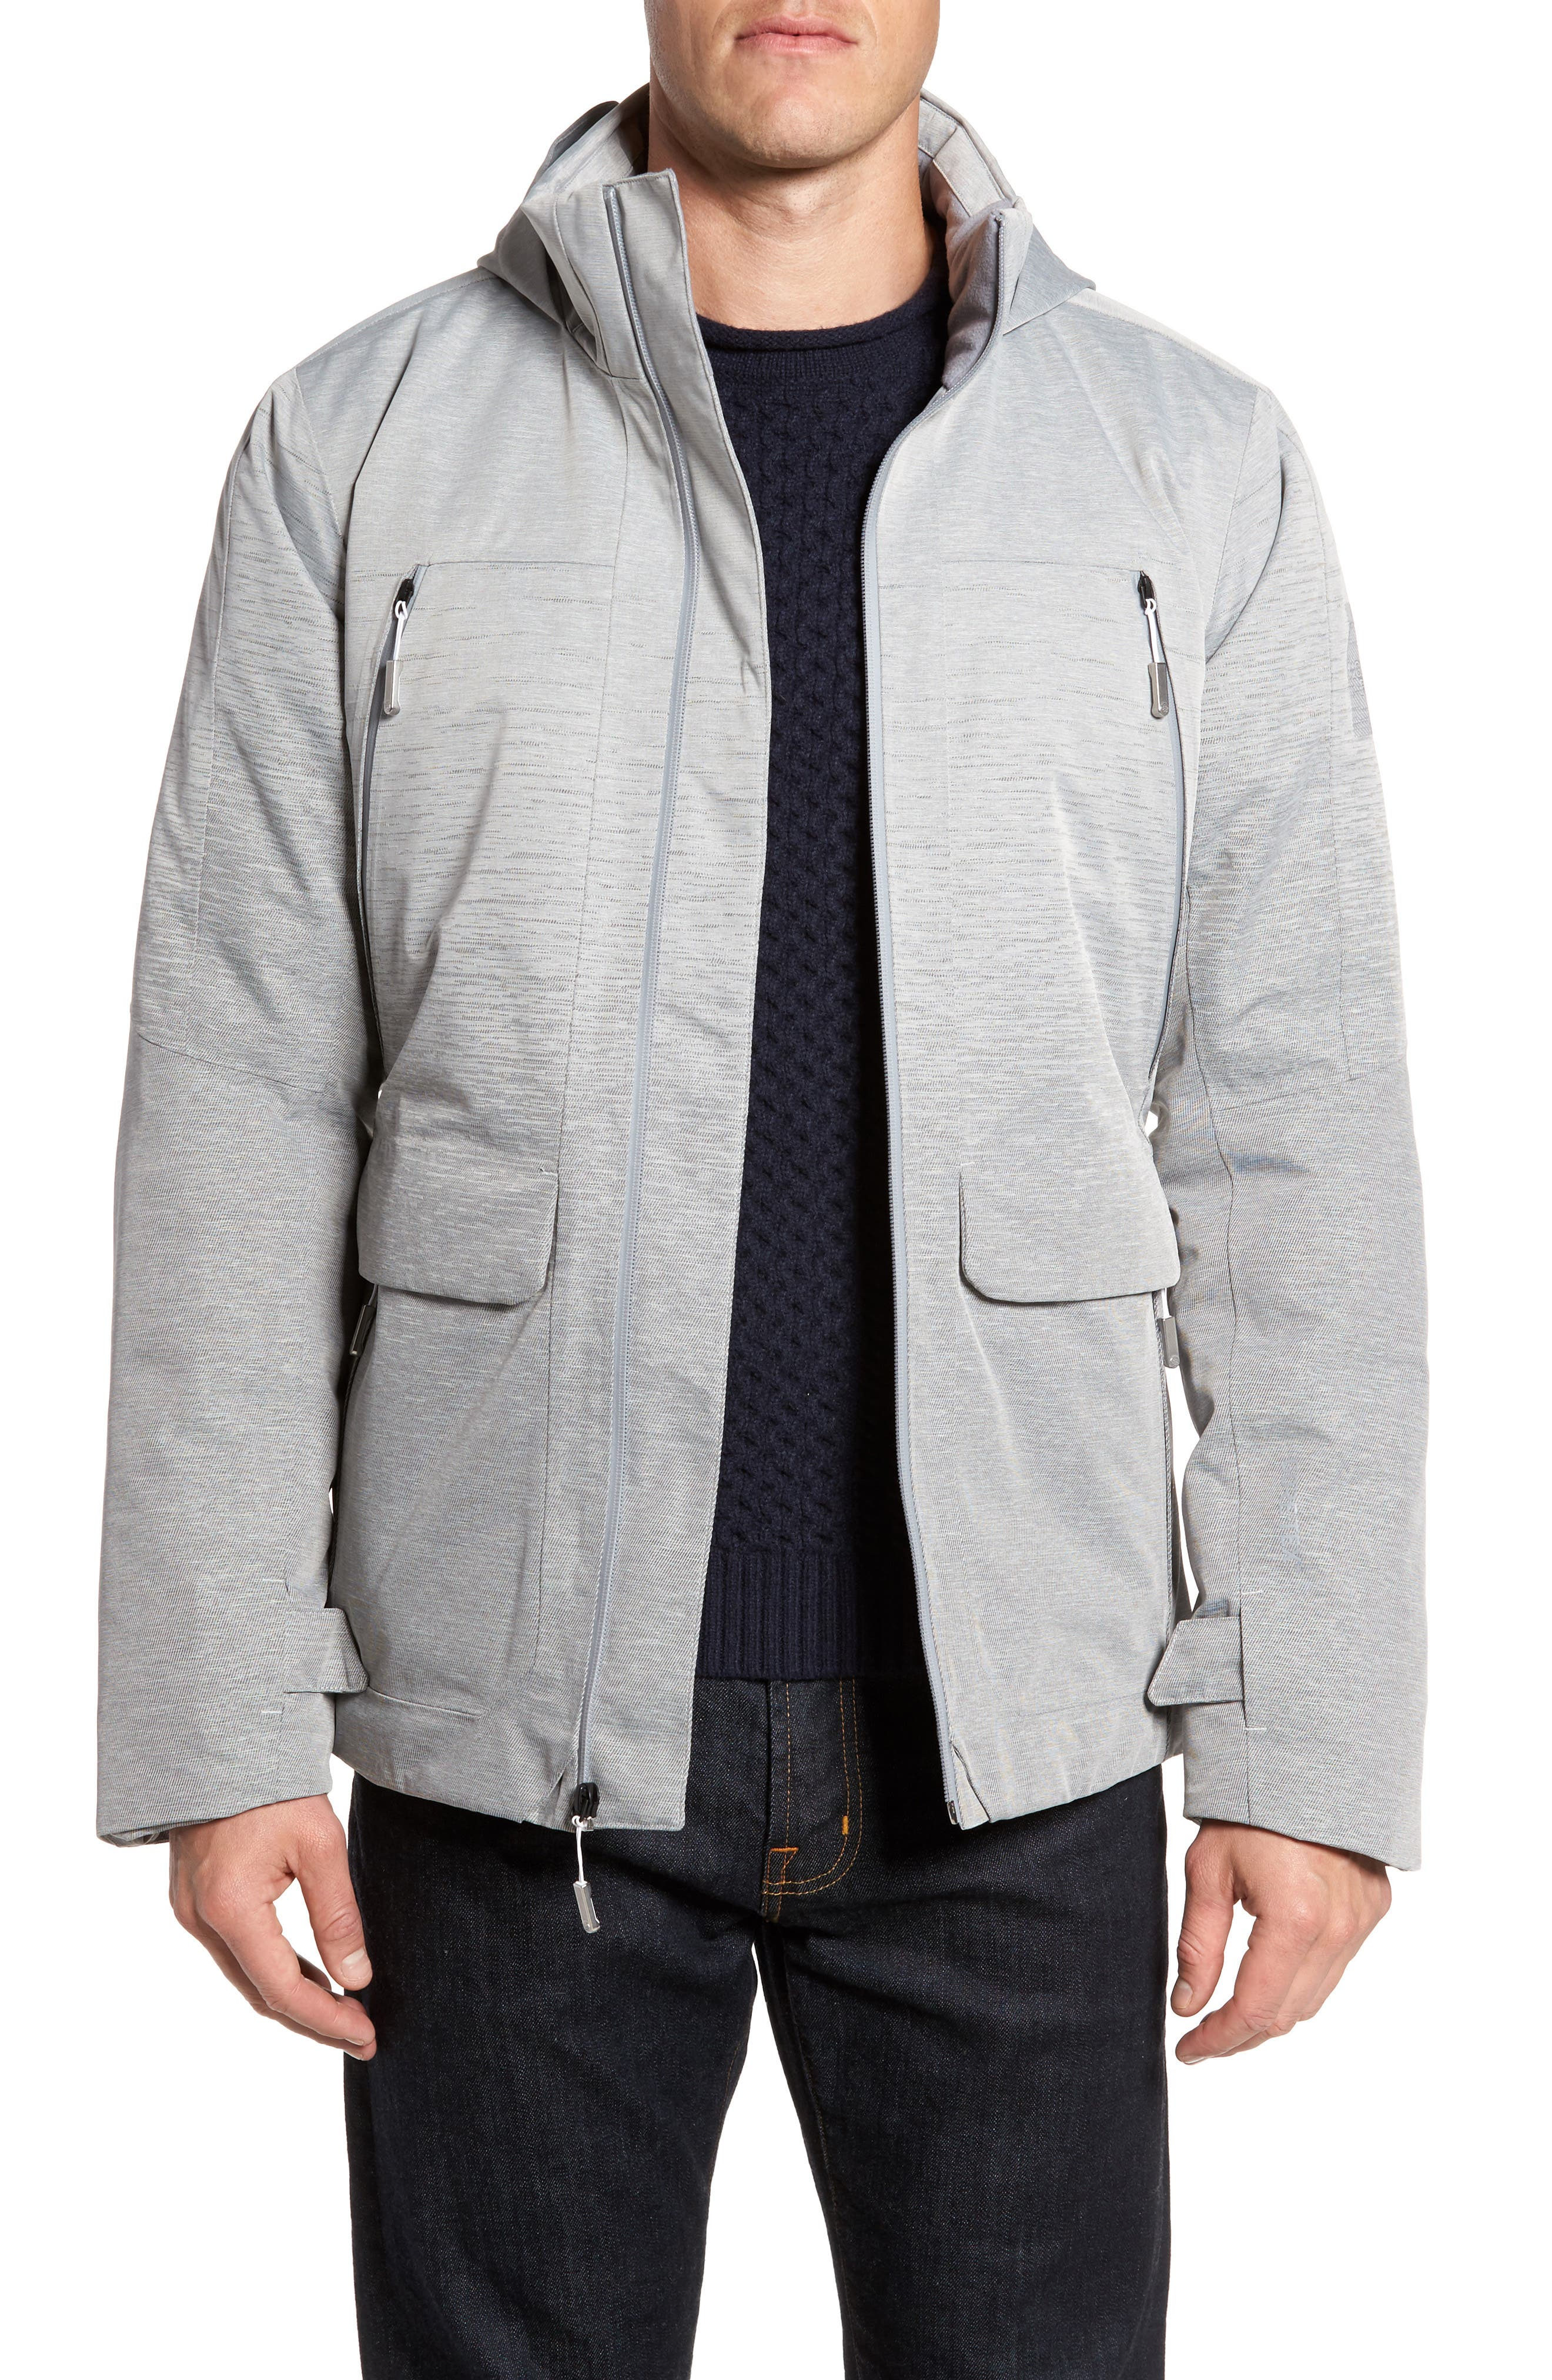 The North Face Cryos Gore-Tex® Jacket